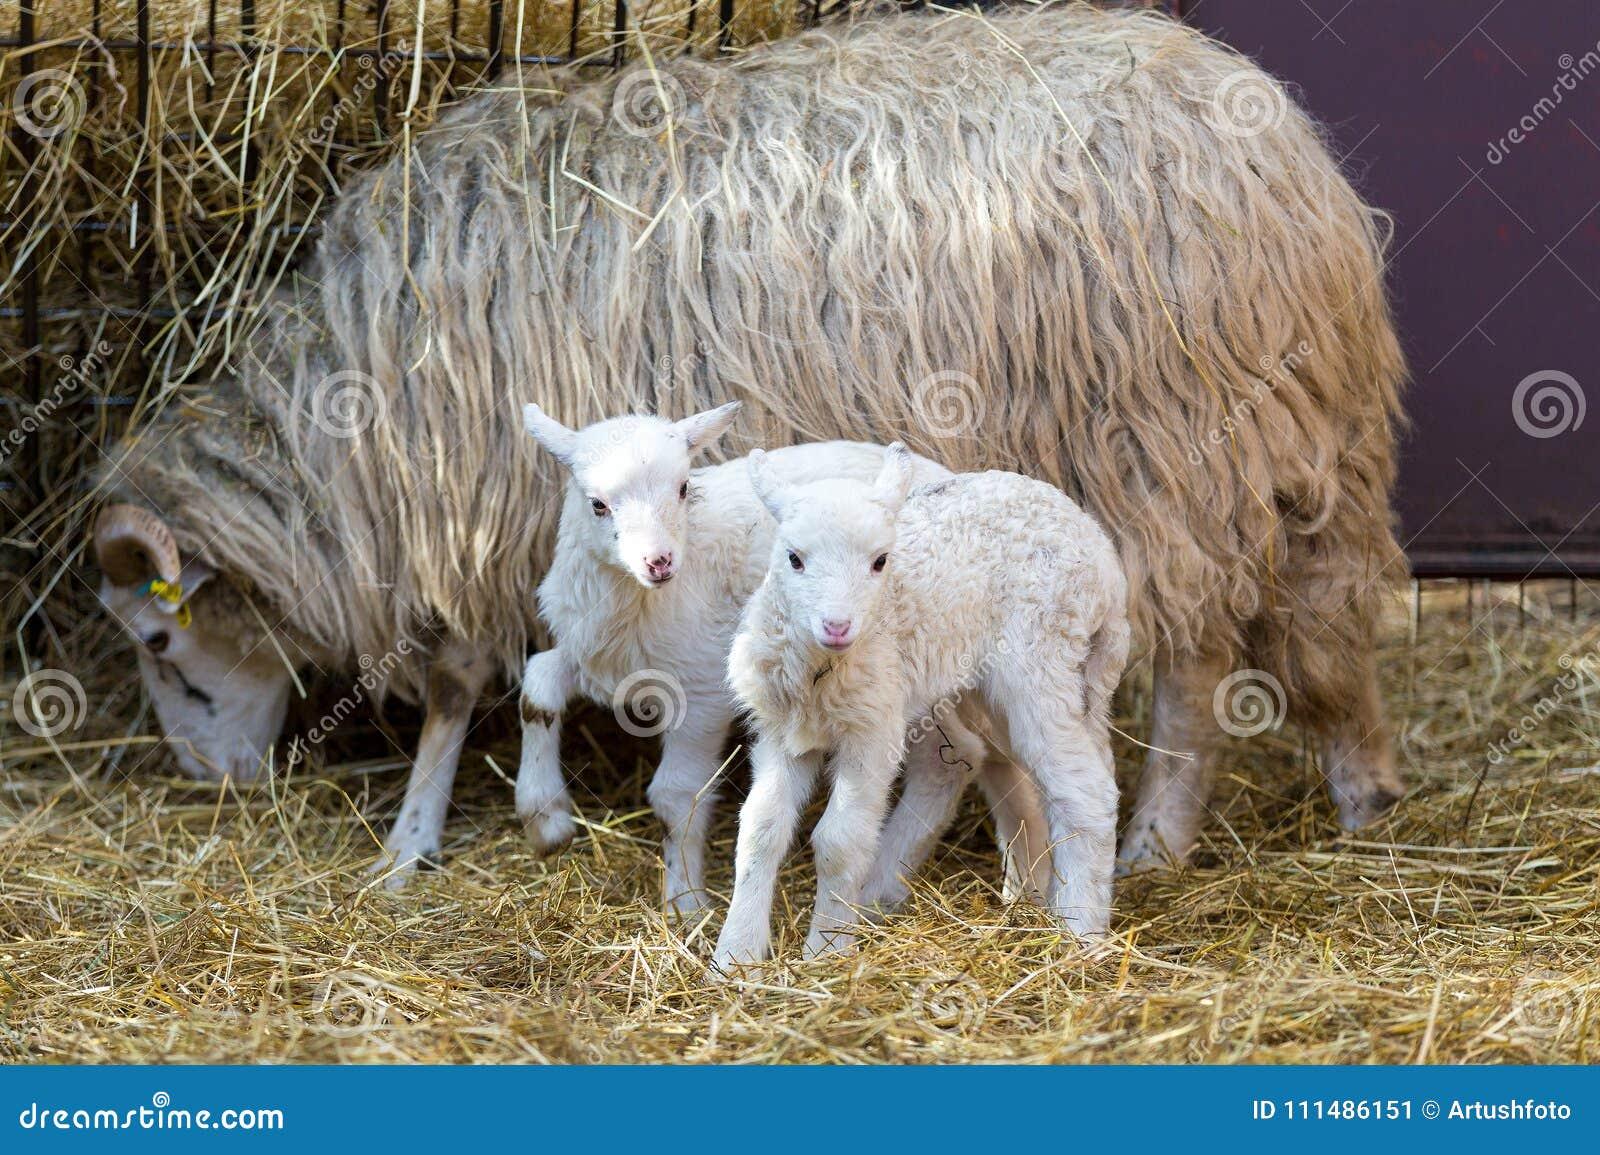 Sheep with lamb, easter symbol